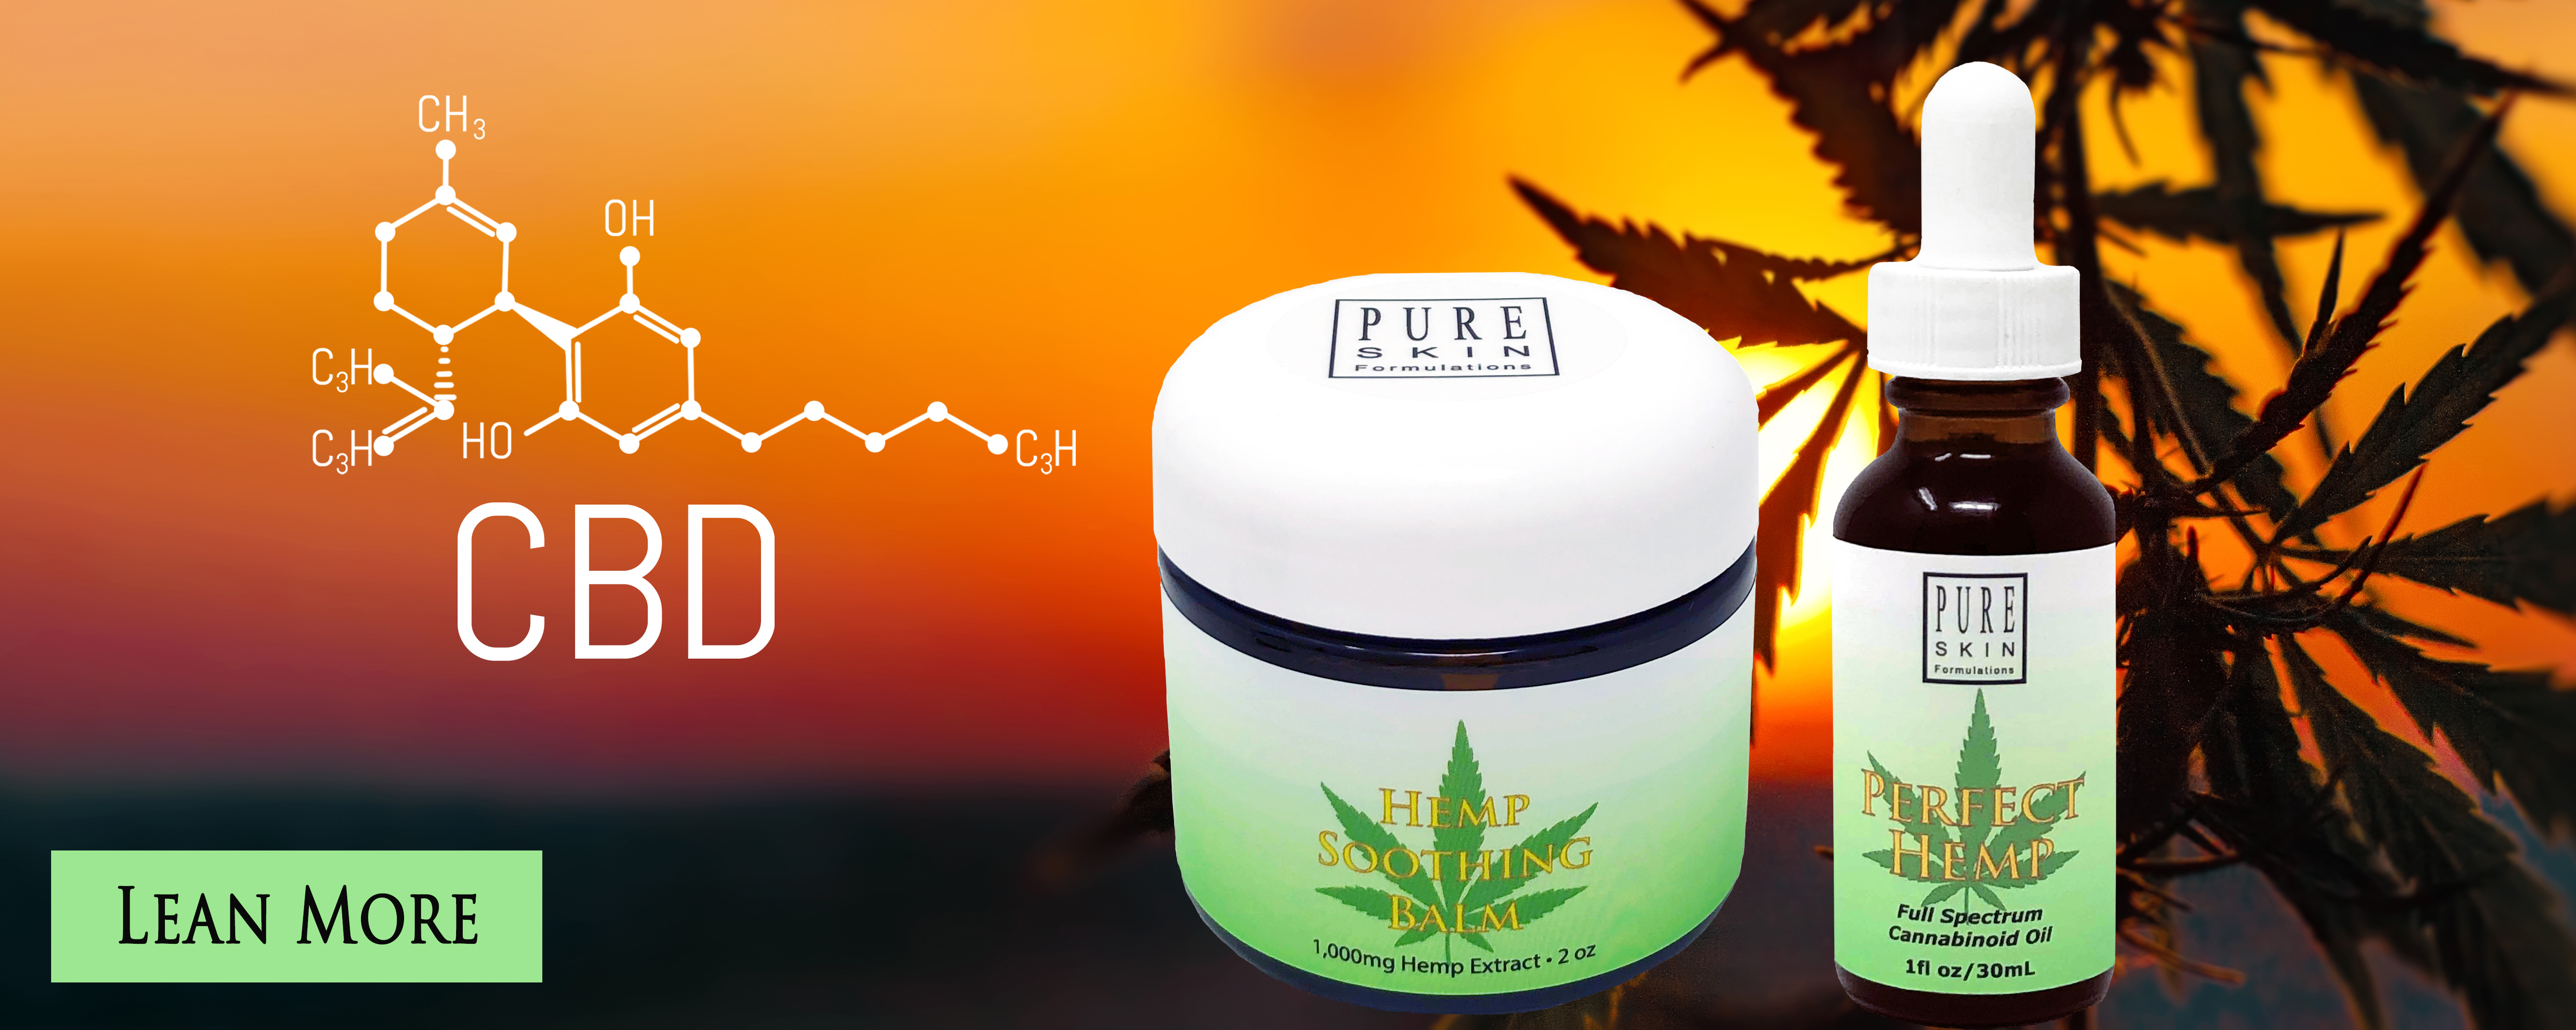 Pure Skin Formulations - Advanced Cosmeceutical Skincare